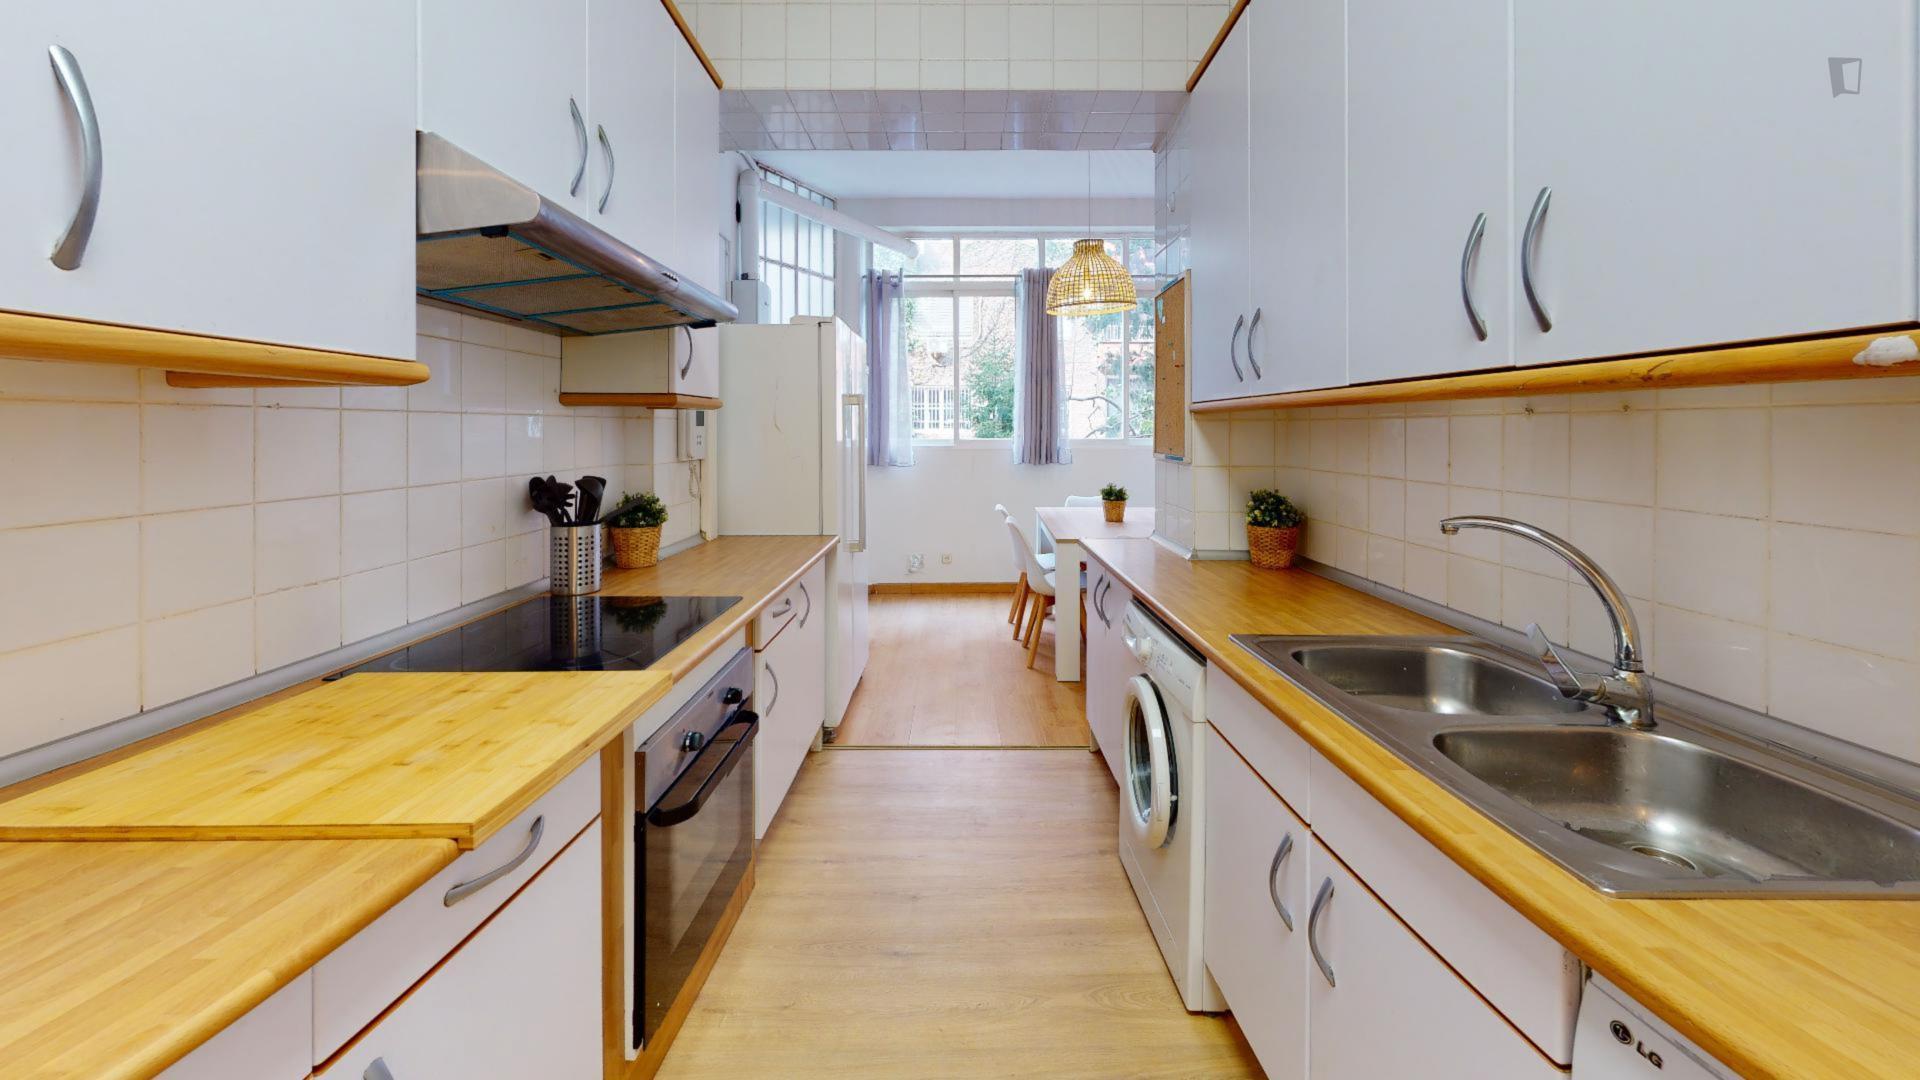 Vallehermoso - Bedroom to rent in Madrid